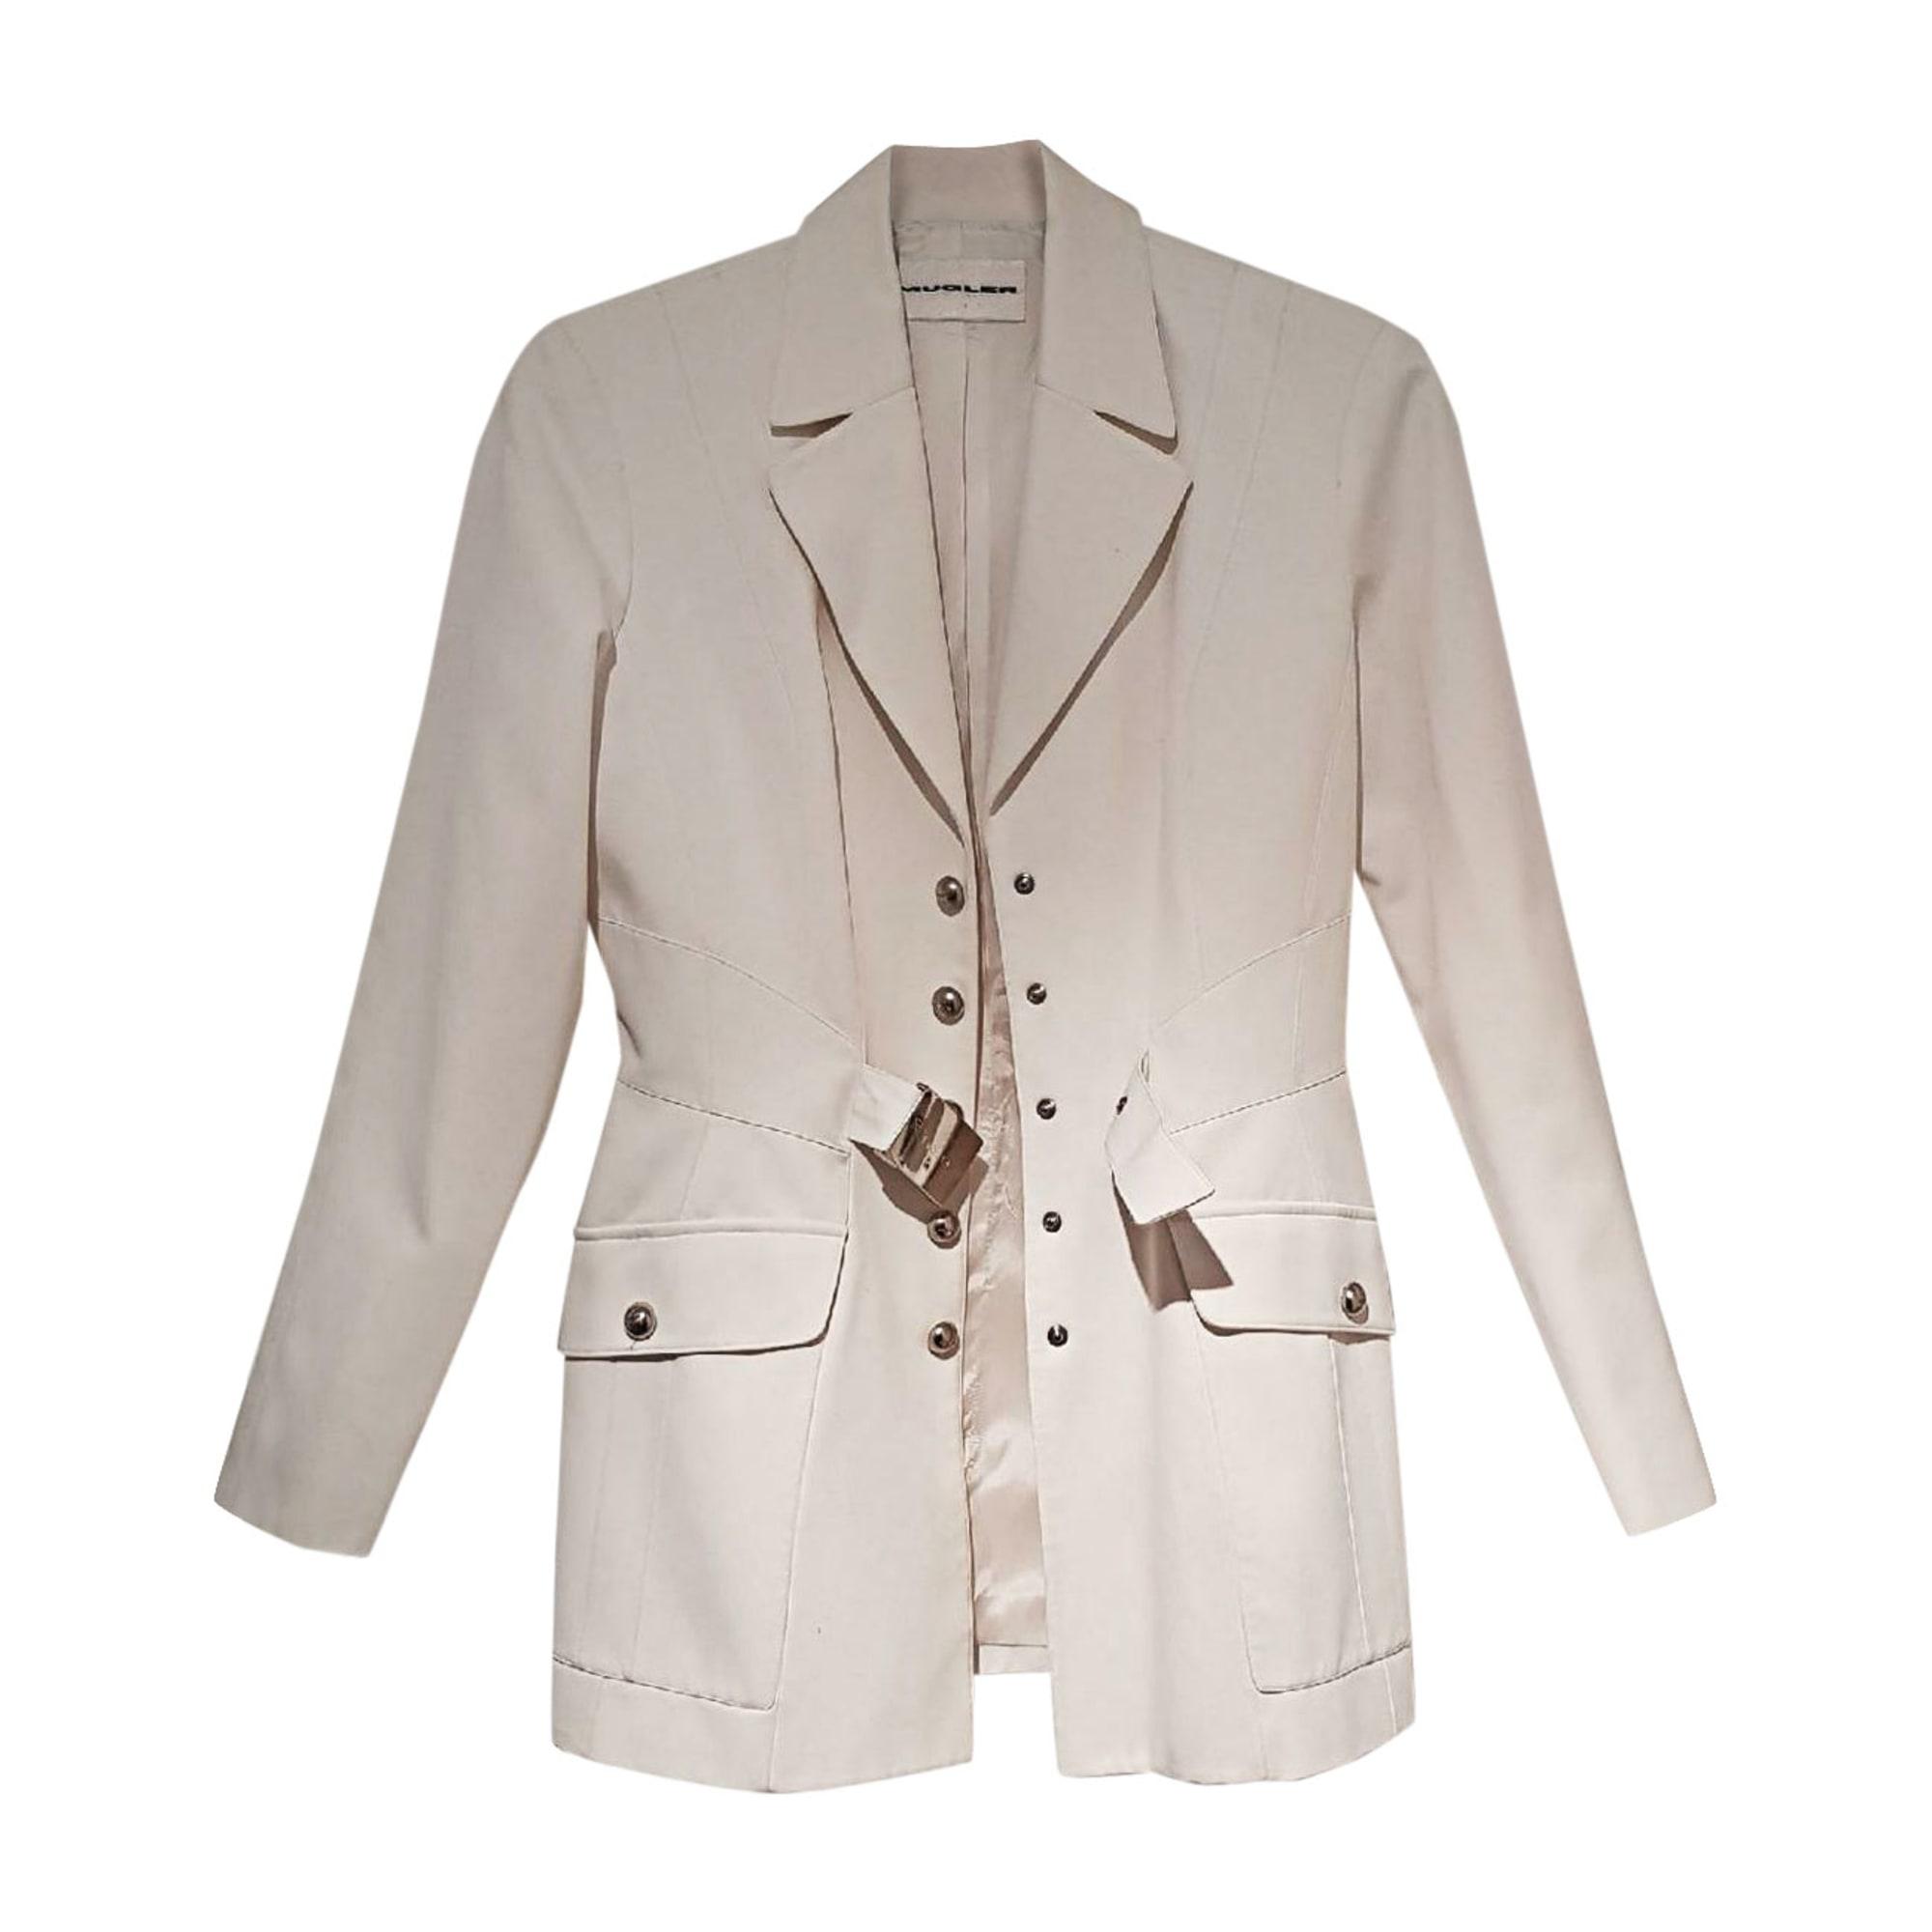 Blazer, veste tailleur THIERRY MUGLER Blanc, blanc cassé, écru